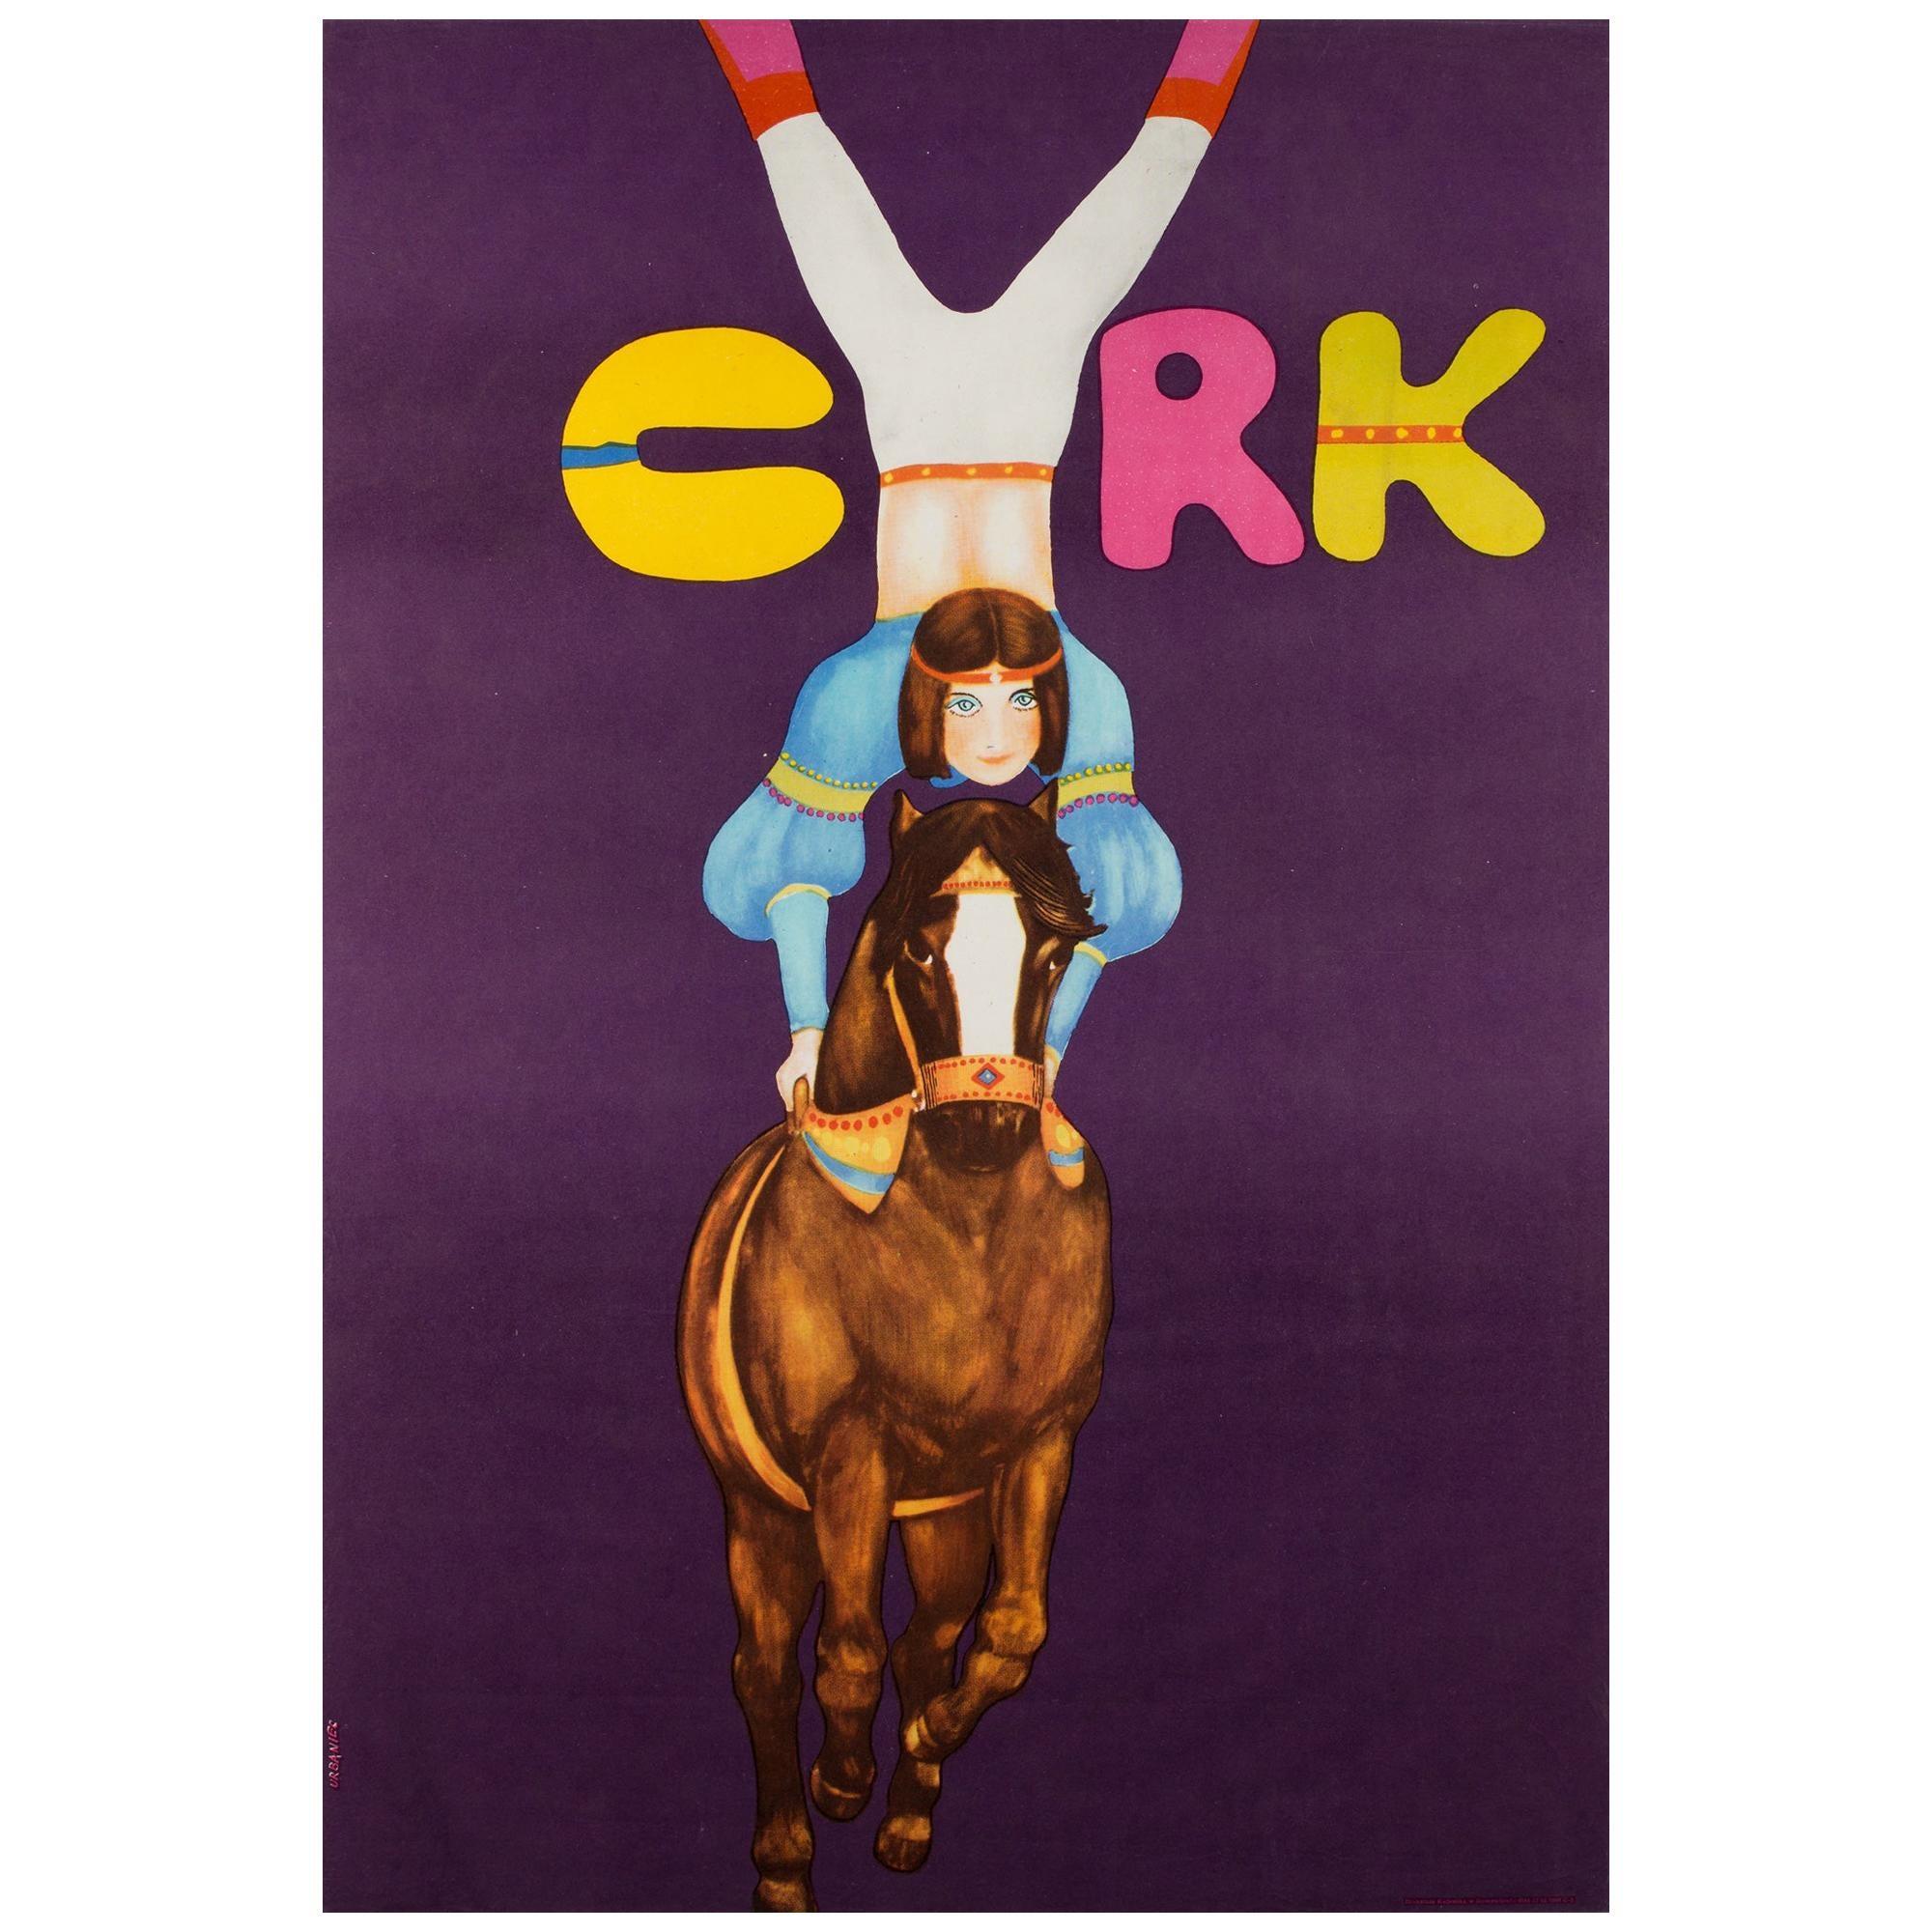 Polish, Cyrk, Circus Poster, 1982, Vintage, HORSE RIDING ACROBAT , URBANIEC